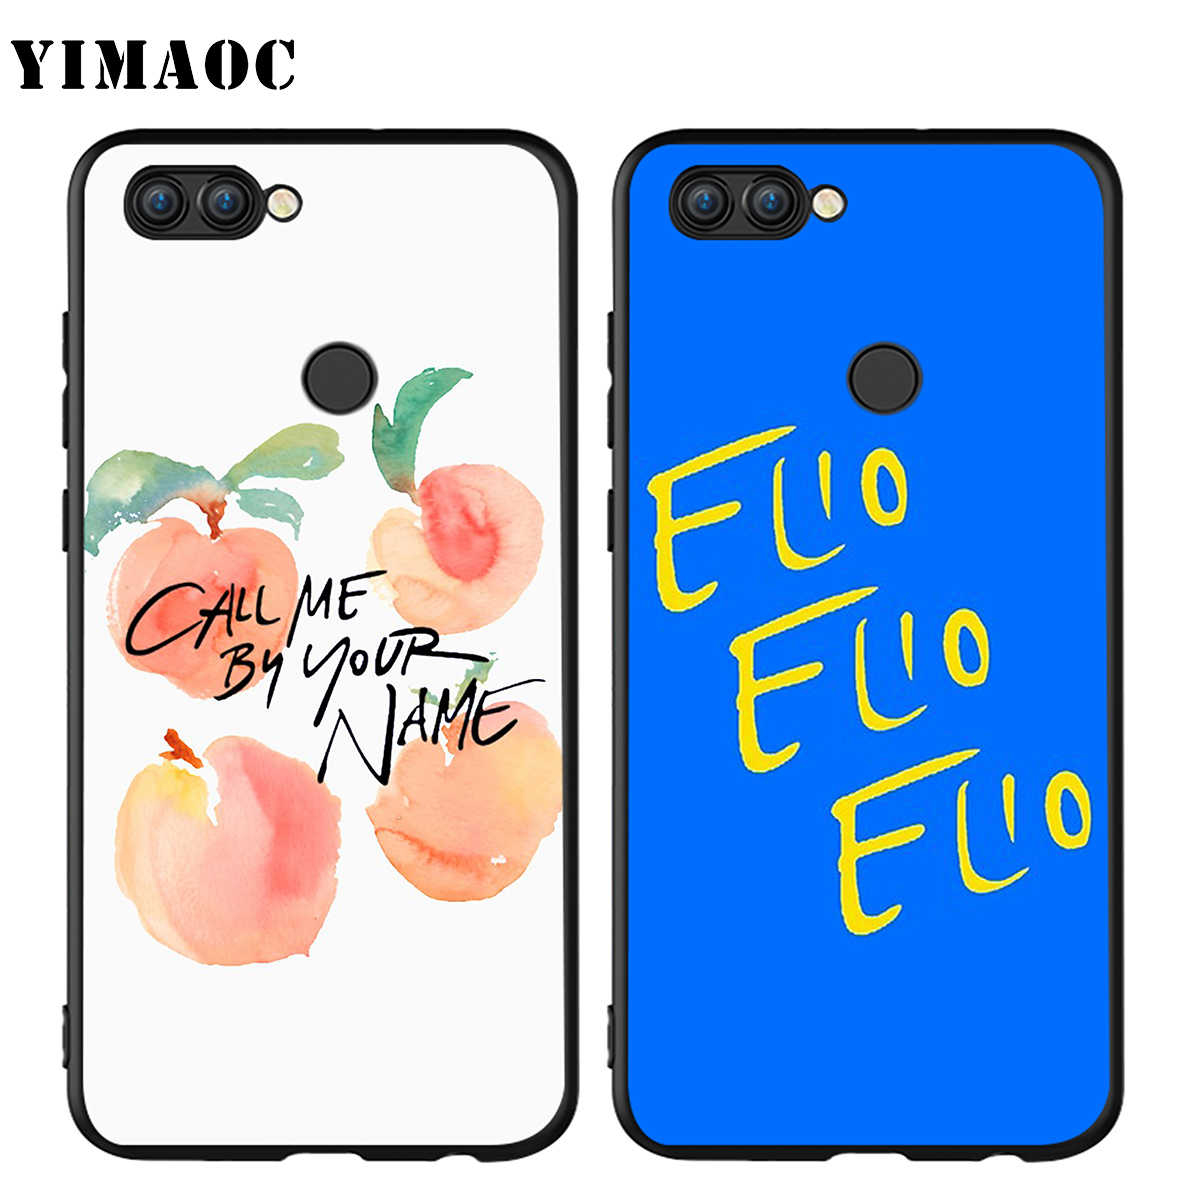 YIMAOC Call Me โดยของคุณชื่อสำหรับ HUAWEI Mate 10 P8 P9 P10 P20 P30 P Smart Lite Pro mini 2017